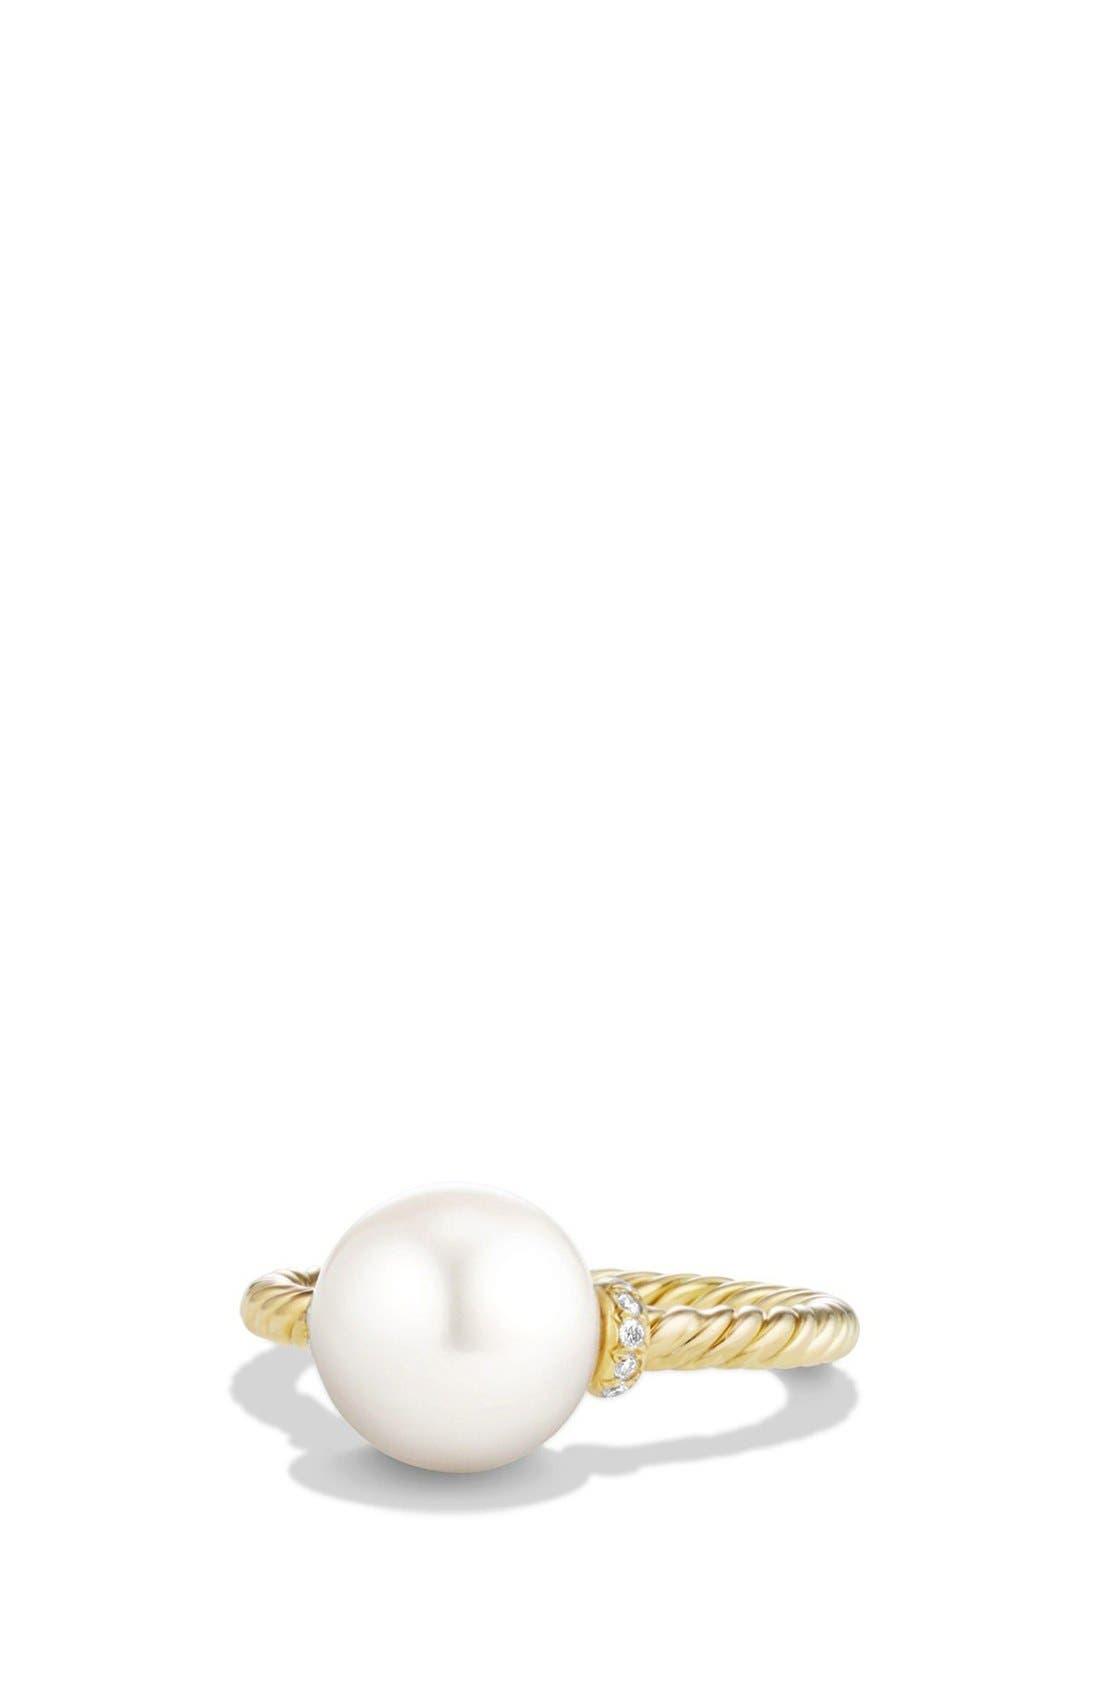 DAVID YURMAN Solari Station Ring with Diamonds and Pearls